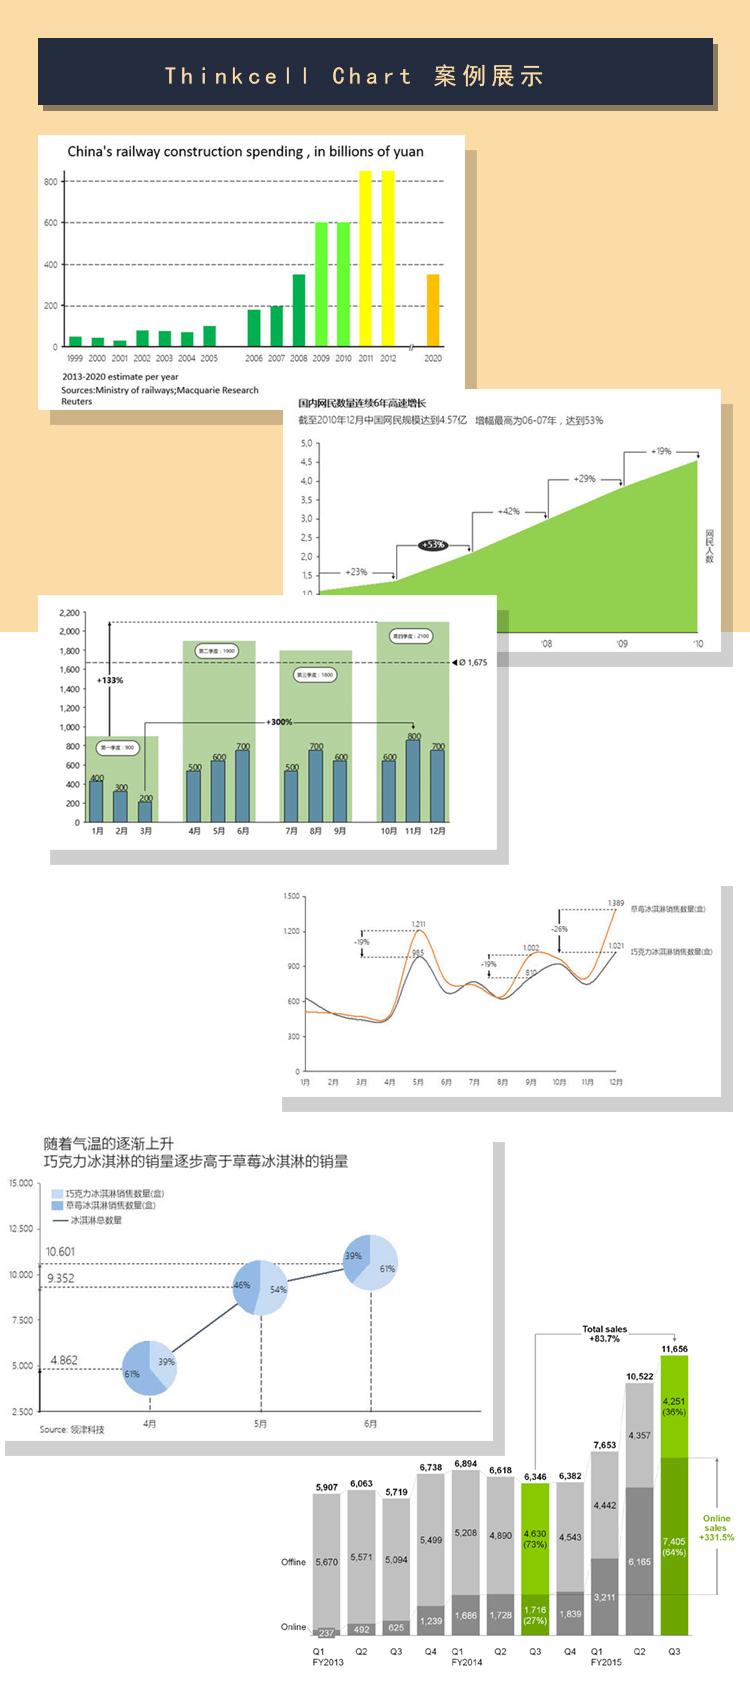 Thinkcell-Chart  企业咨询级PPT图表制作教程2.5.jpg